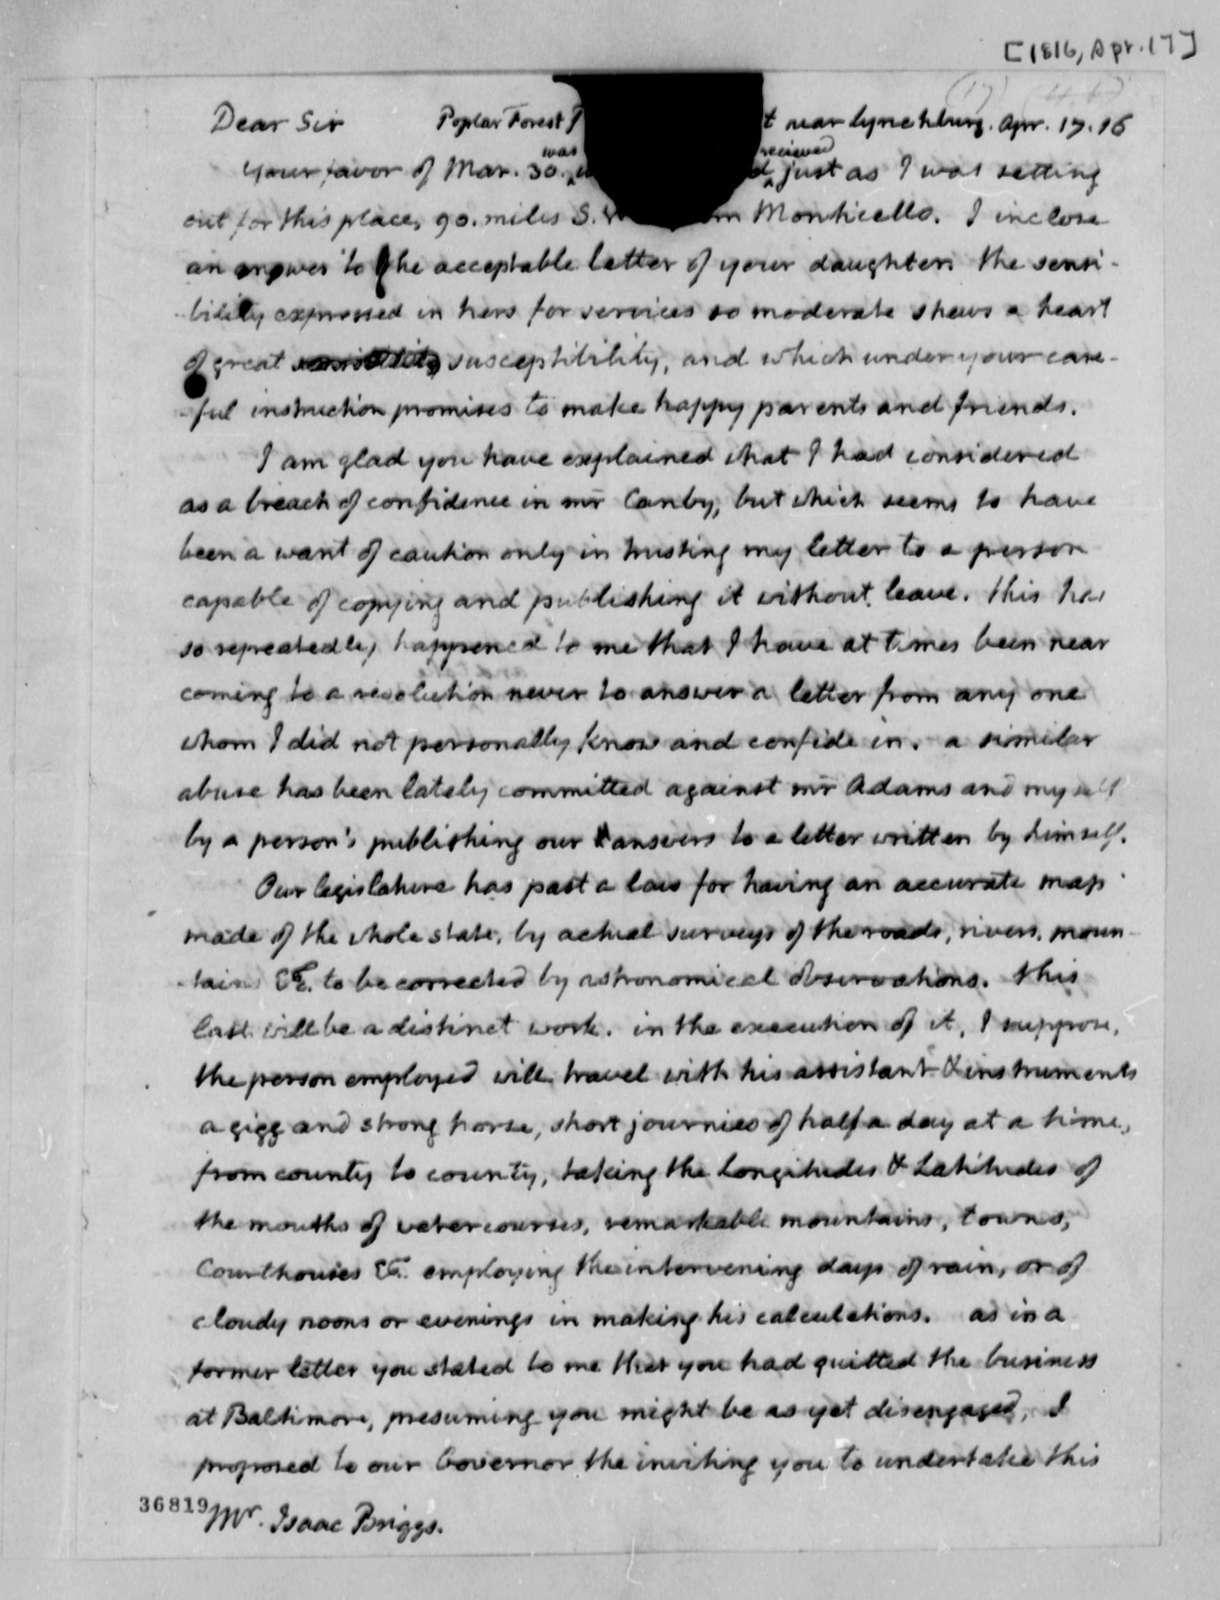 Thomas Jefferson to Isaac Briggs, April 17, 1816